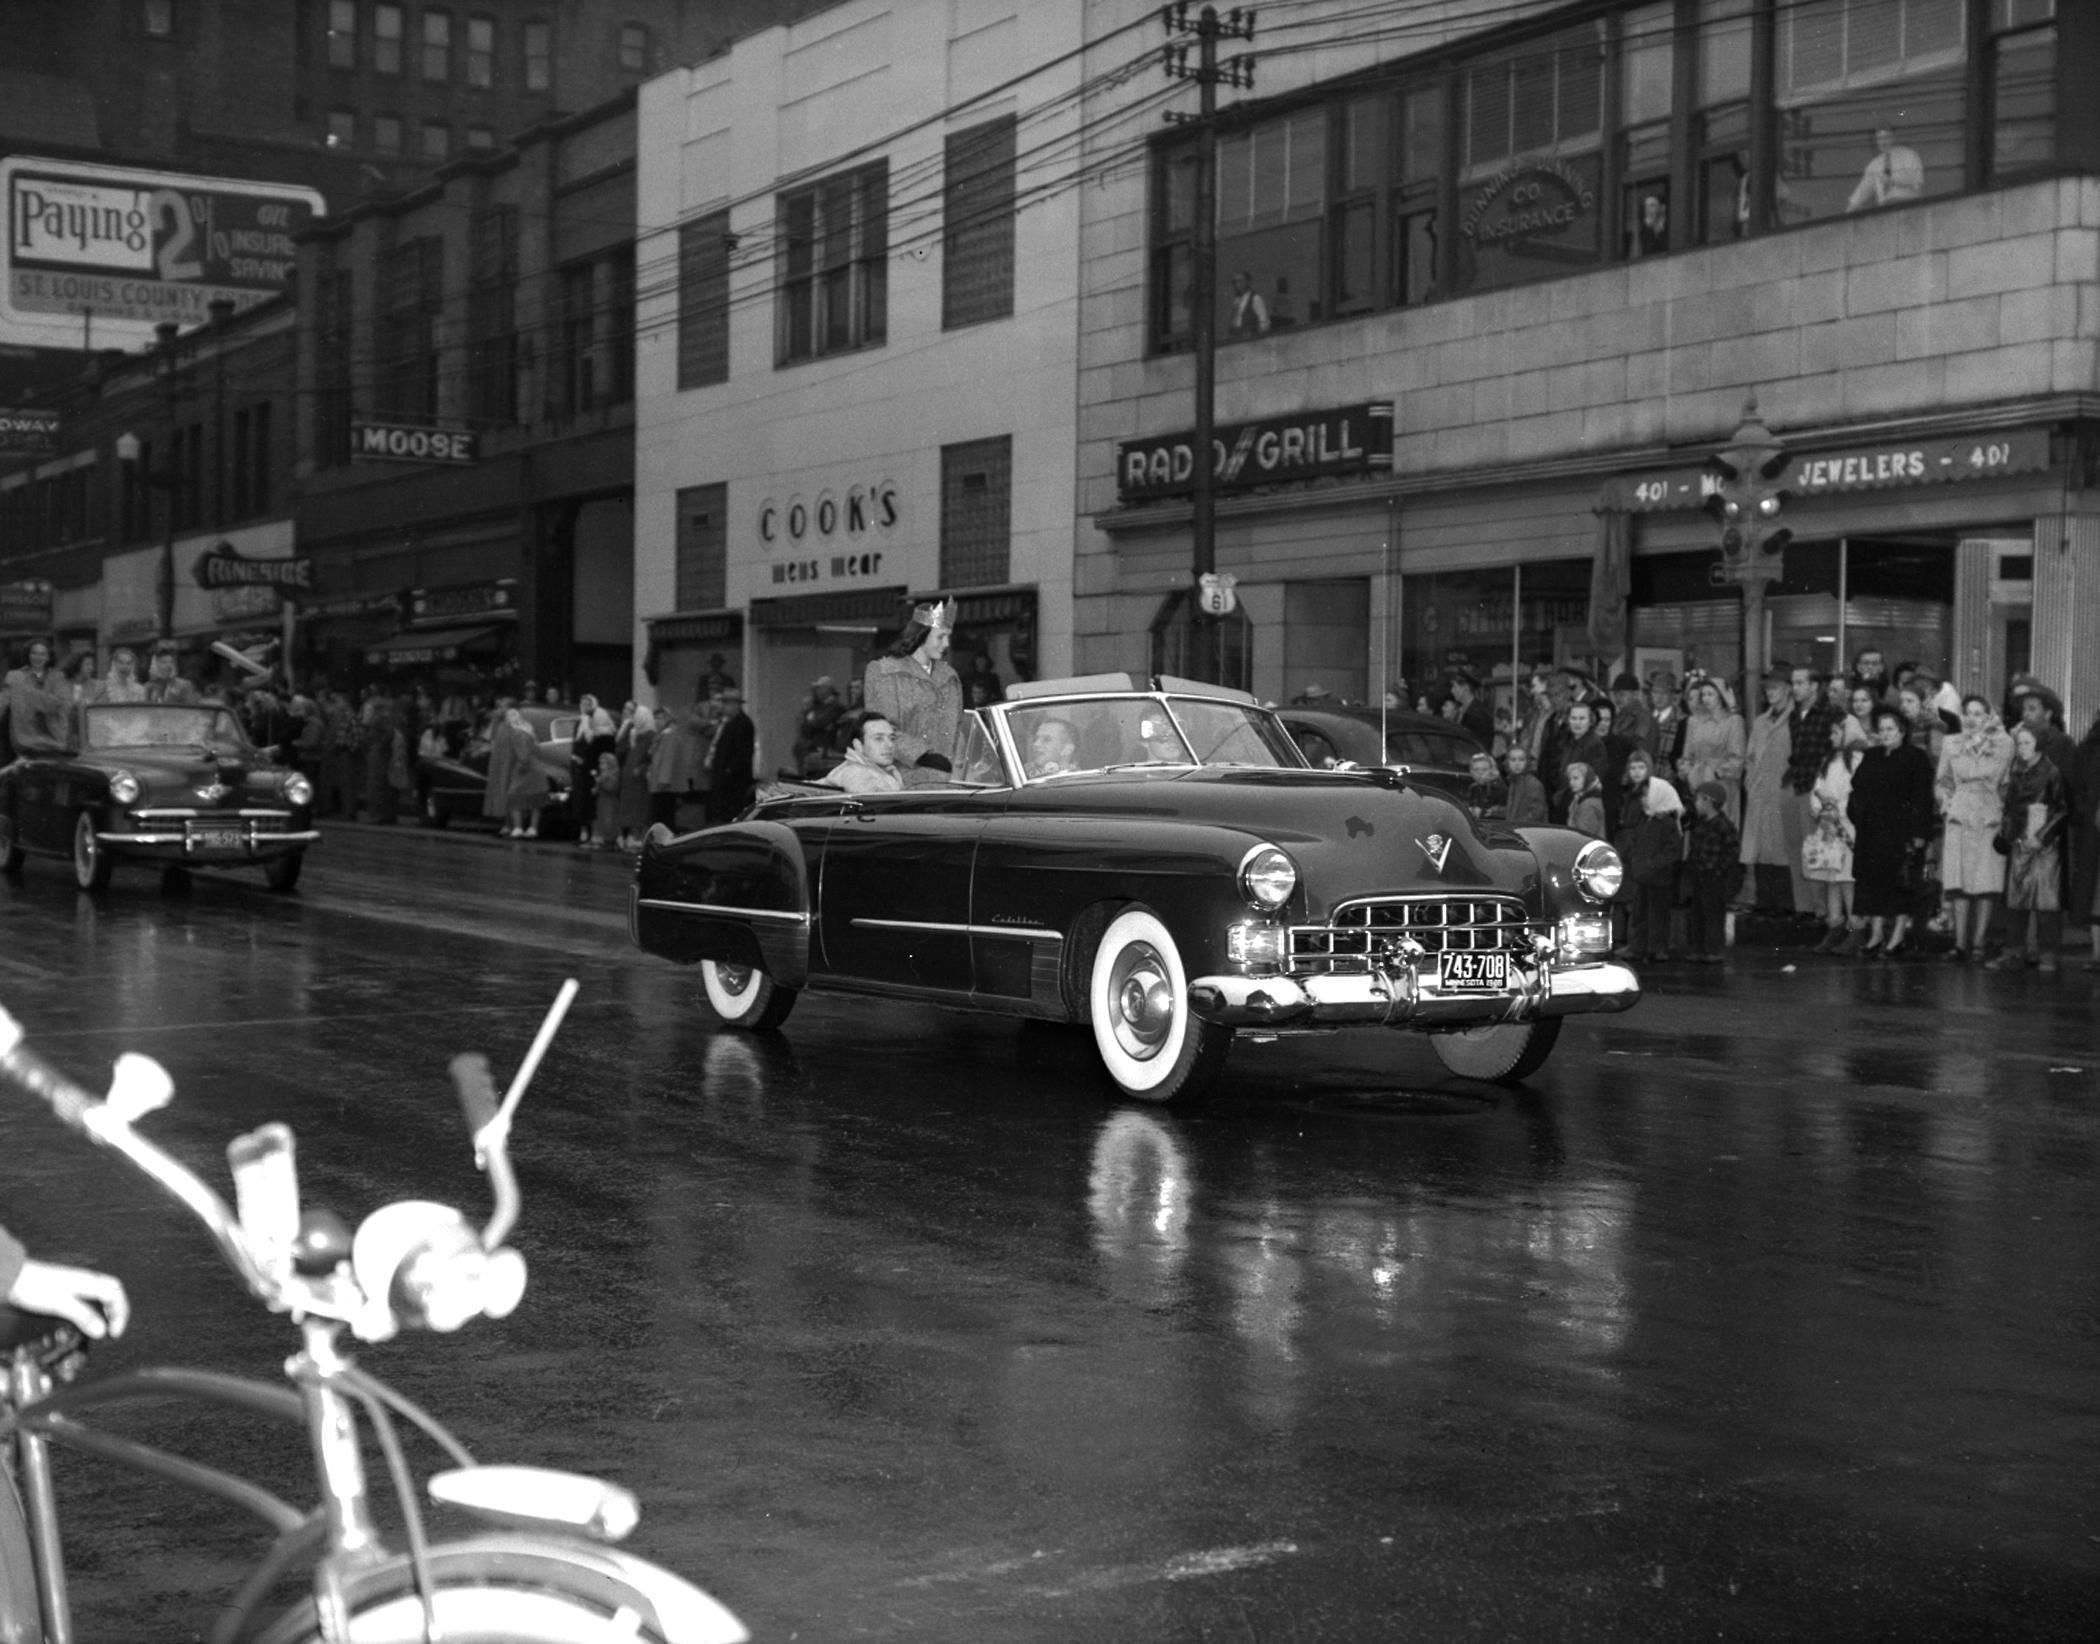 UMD Homecoming 1948